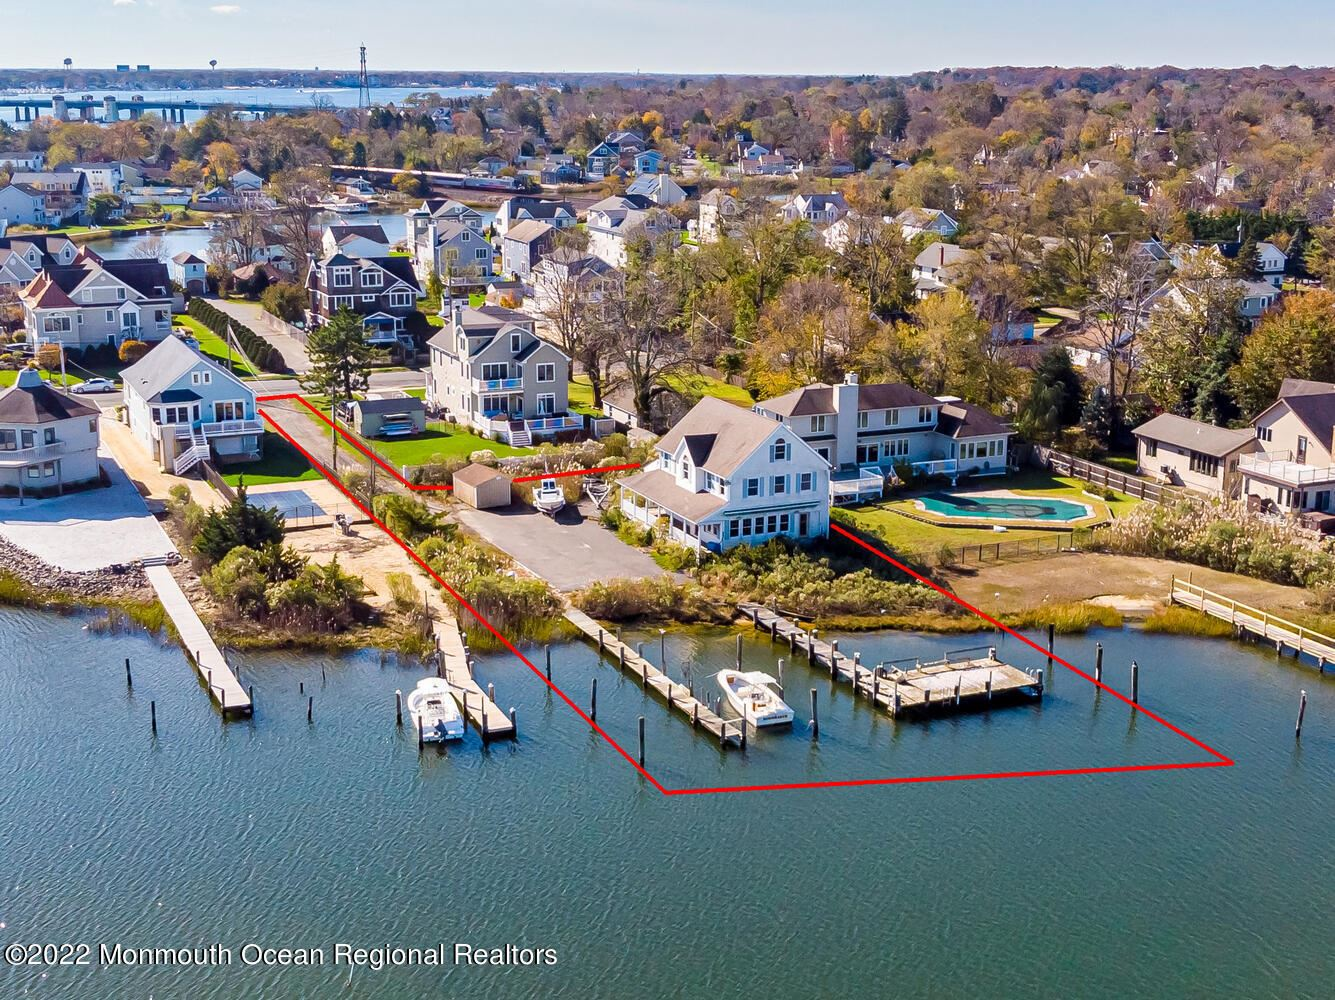 314/316.5 Fisk Avenue                                                                               Brielle                                                                      , NJ - $2,499,000